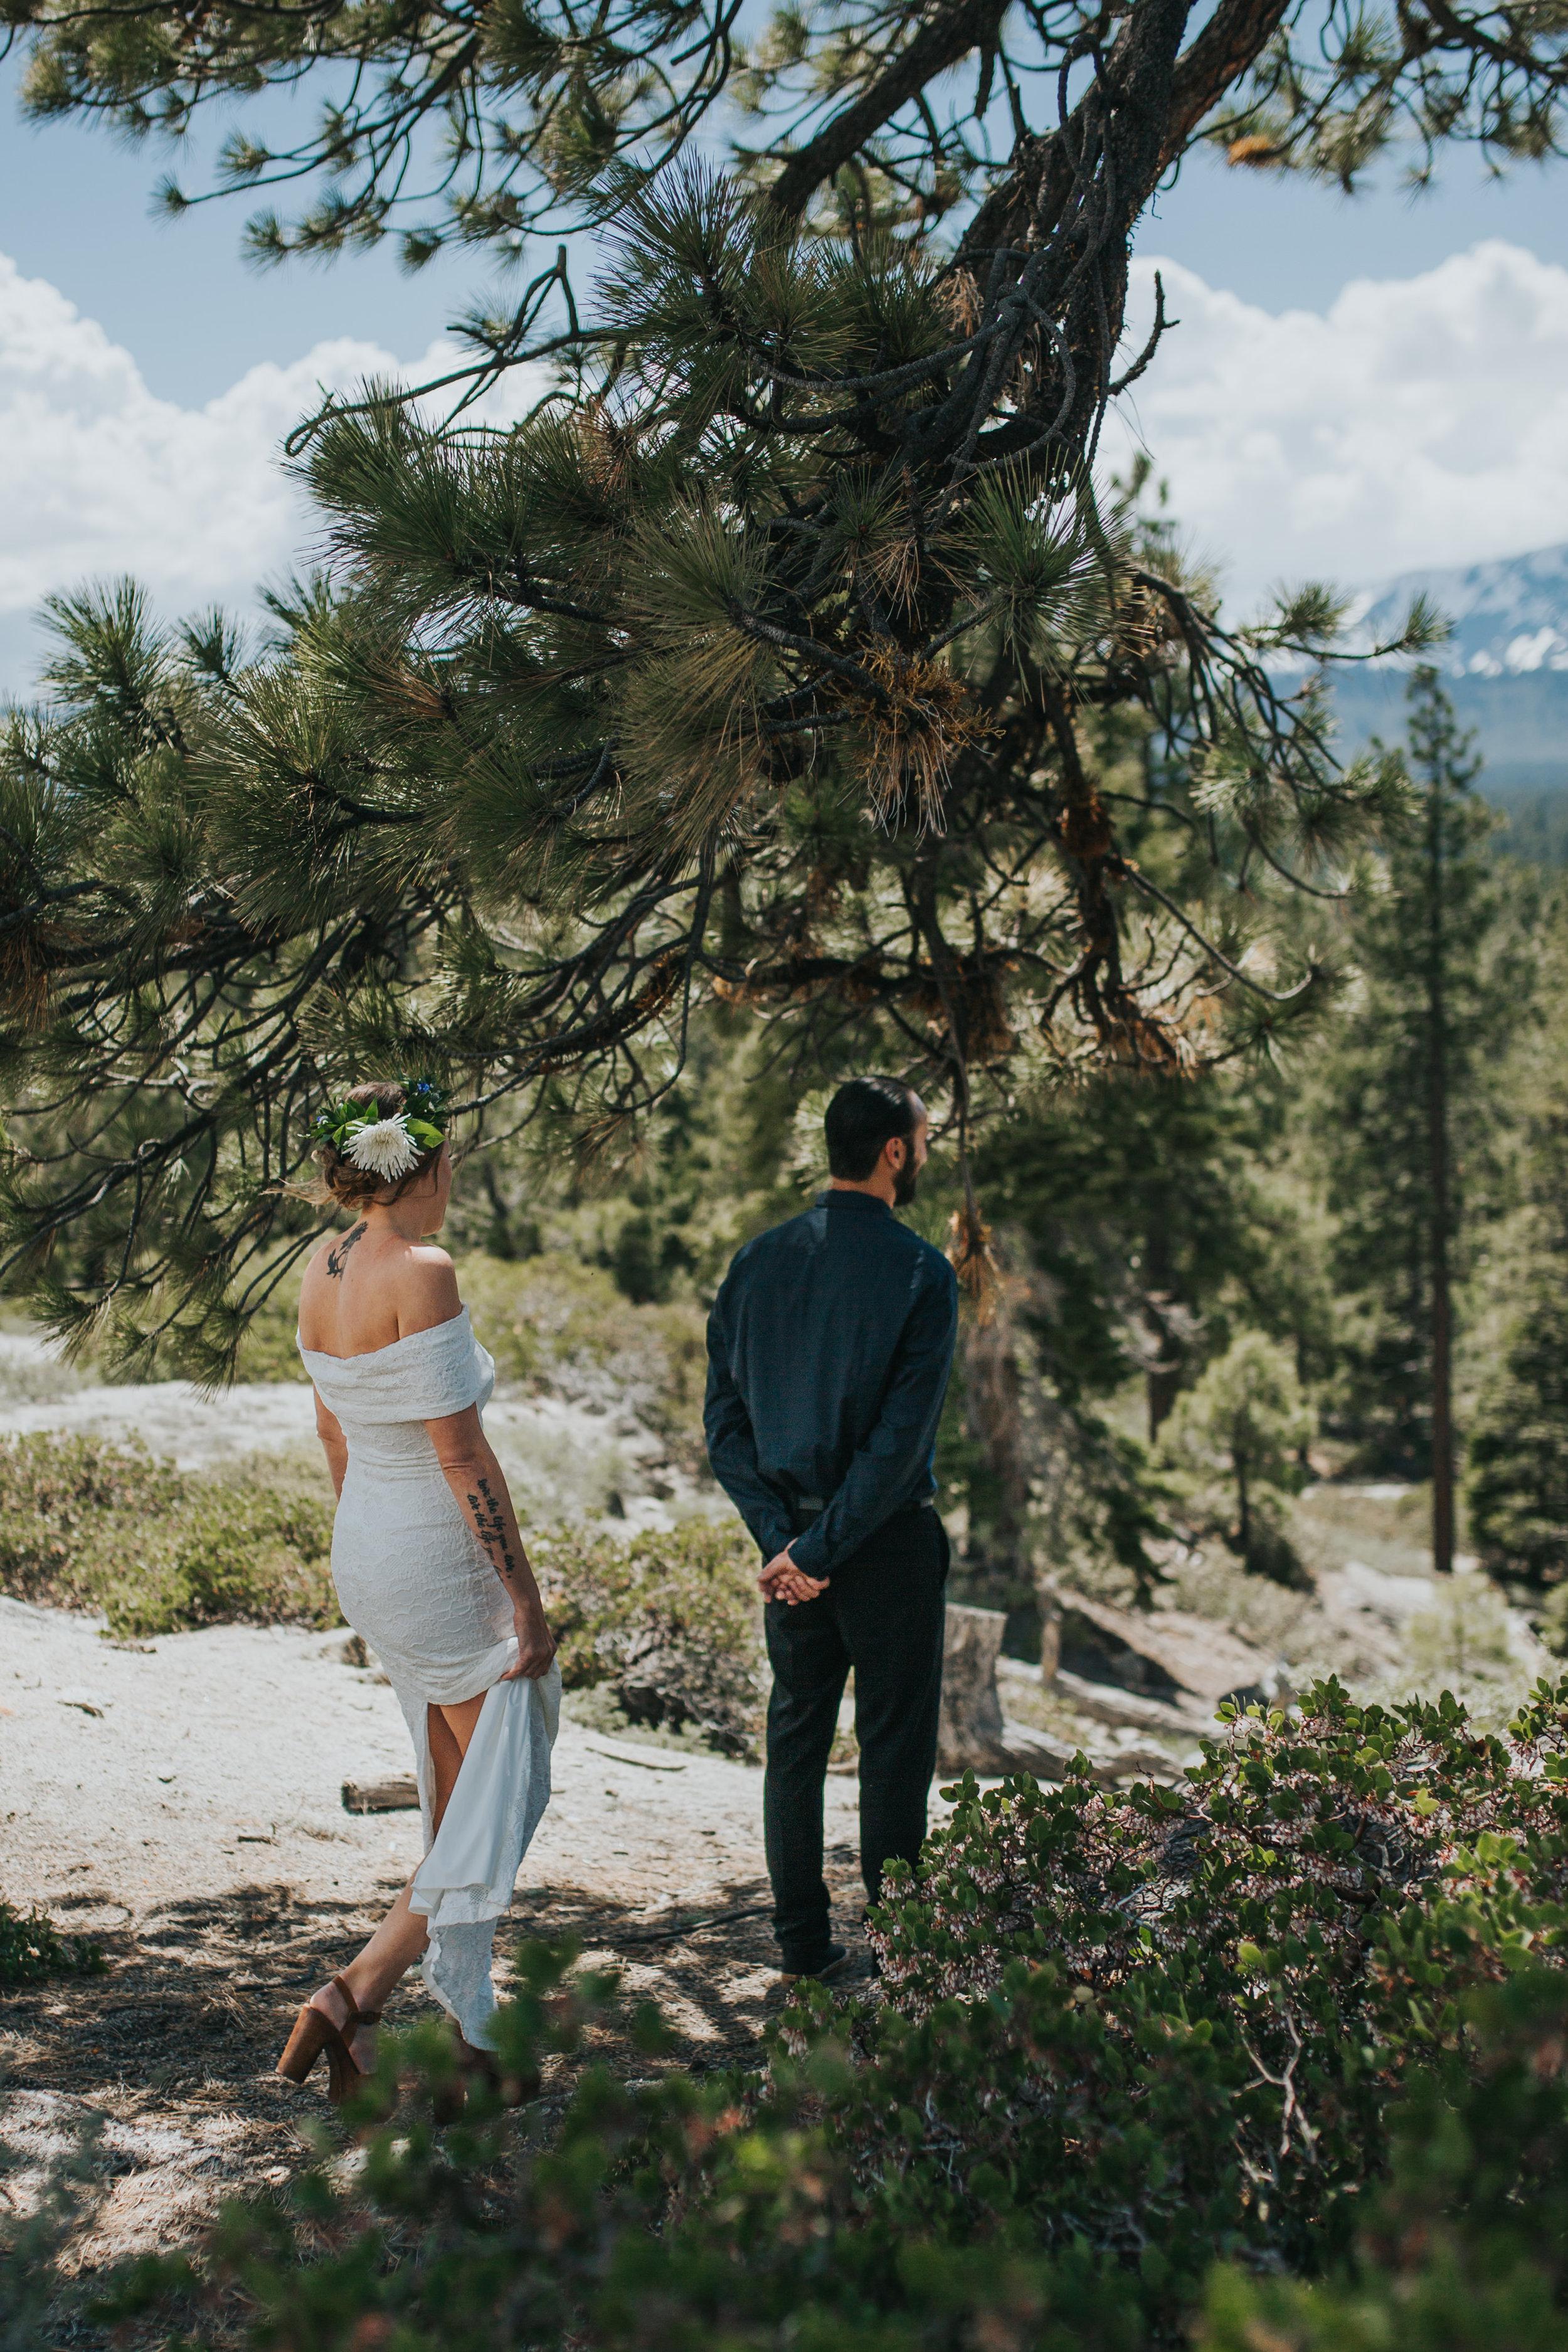 south-lake-tahoe-elopement-valerie-lendvay-photo-004.jpg